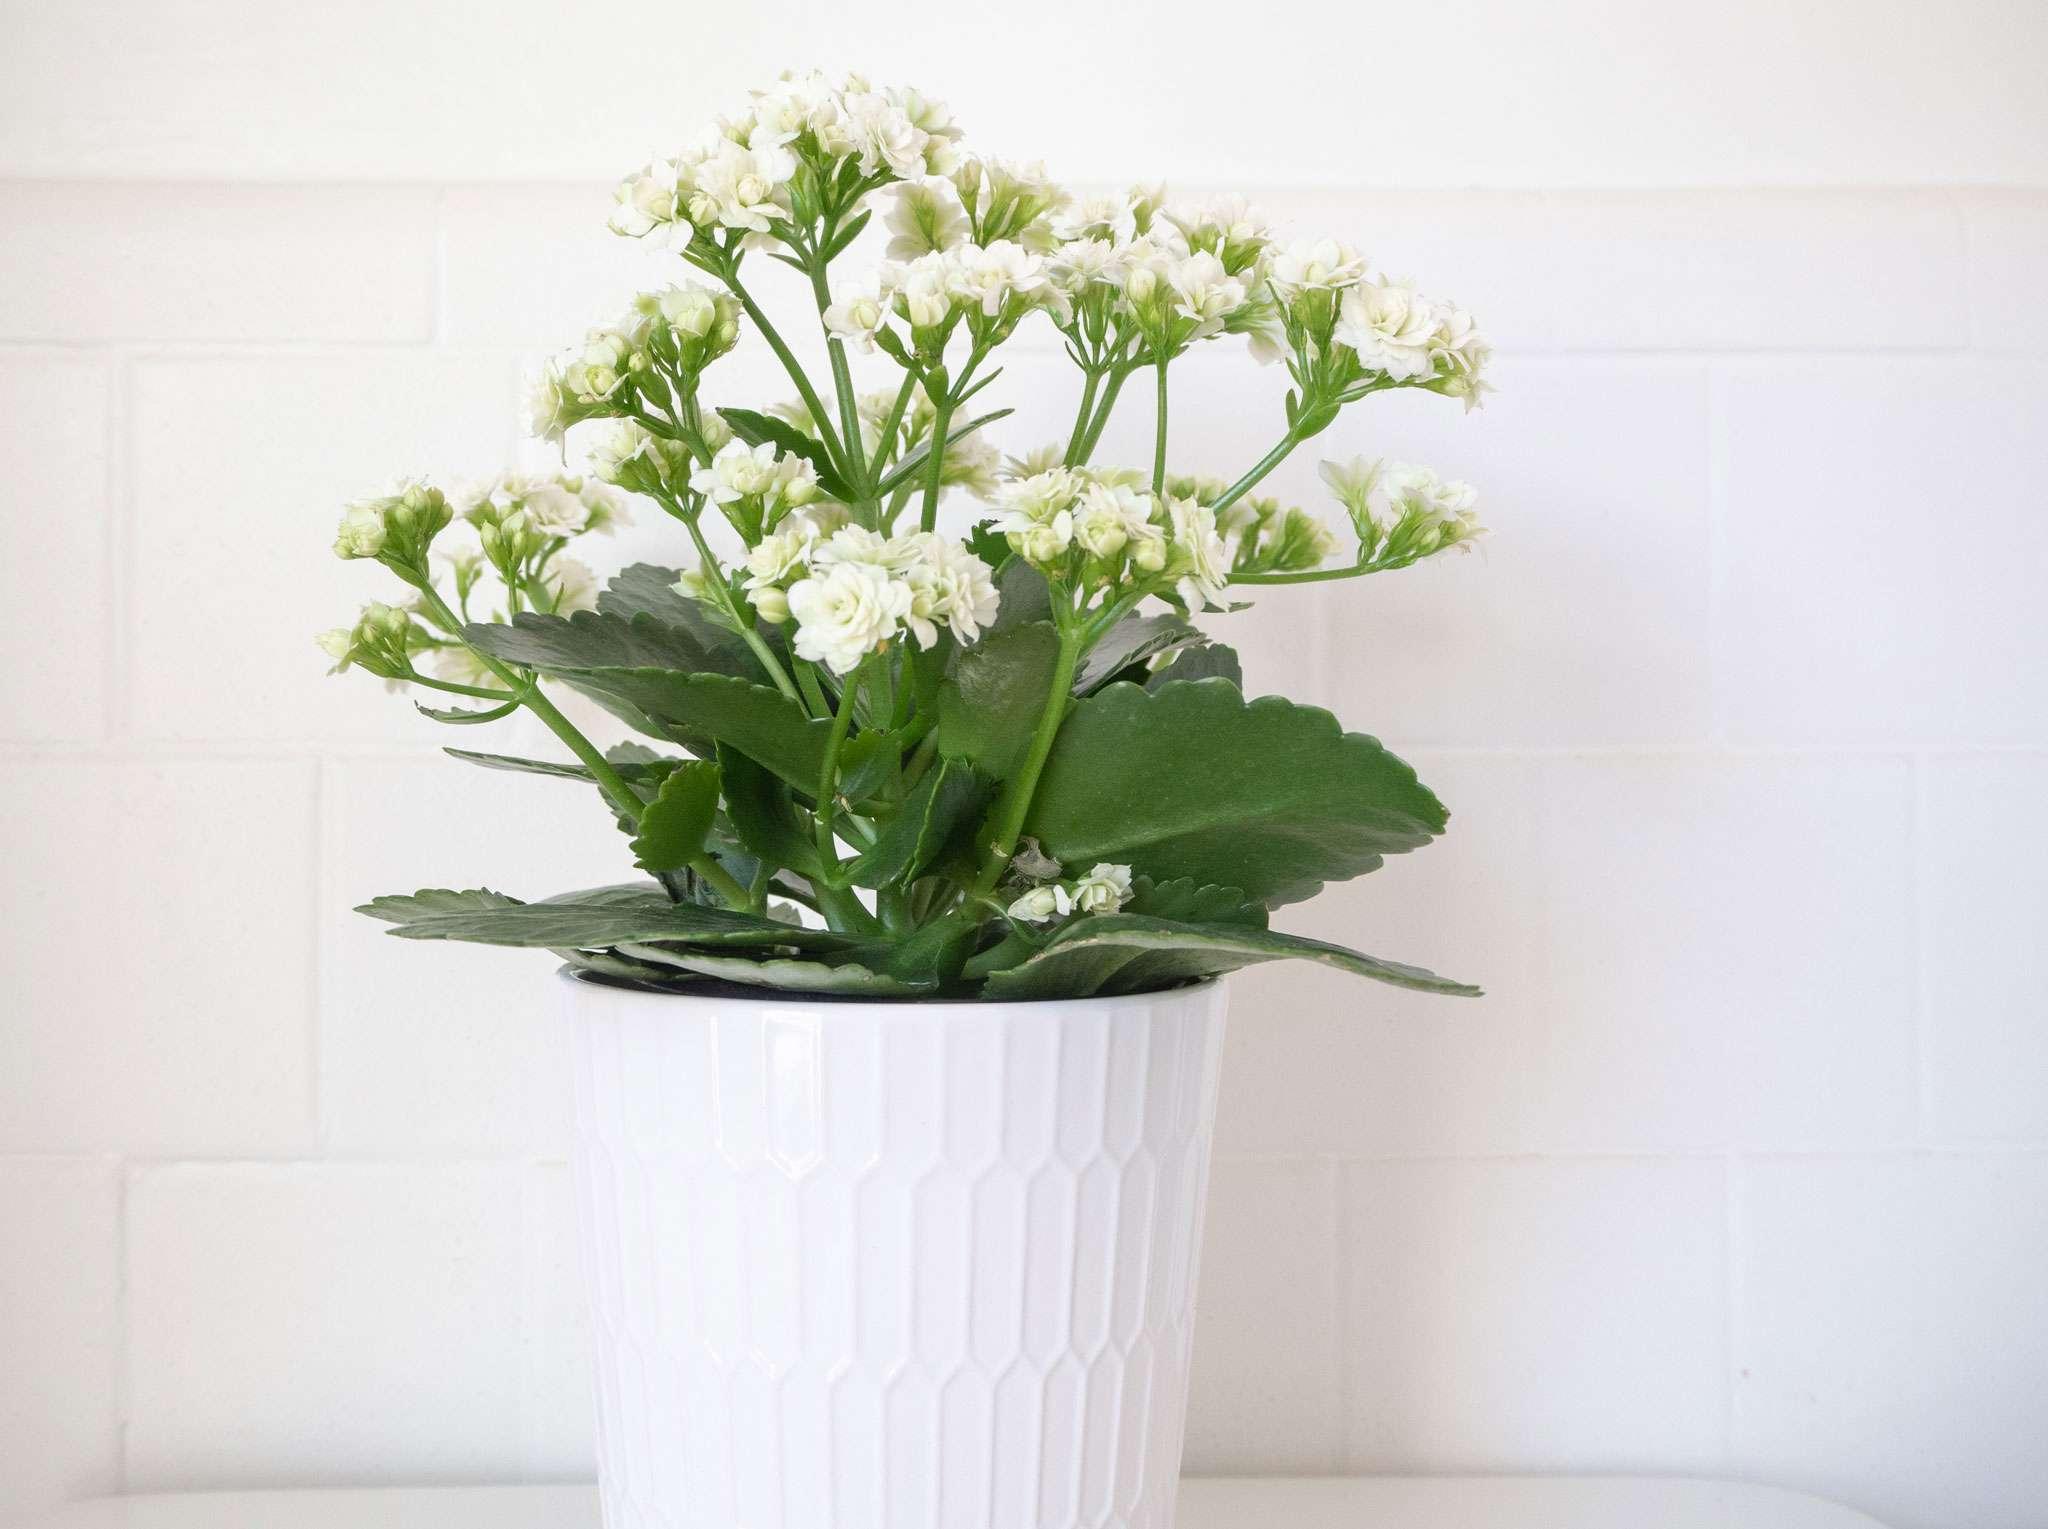 a kalanchoe plant indoors